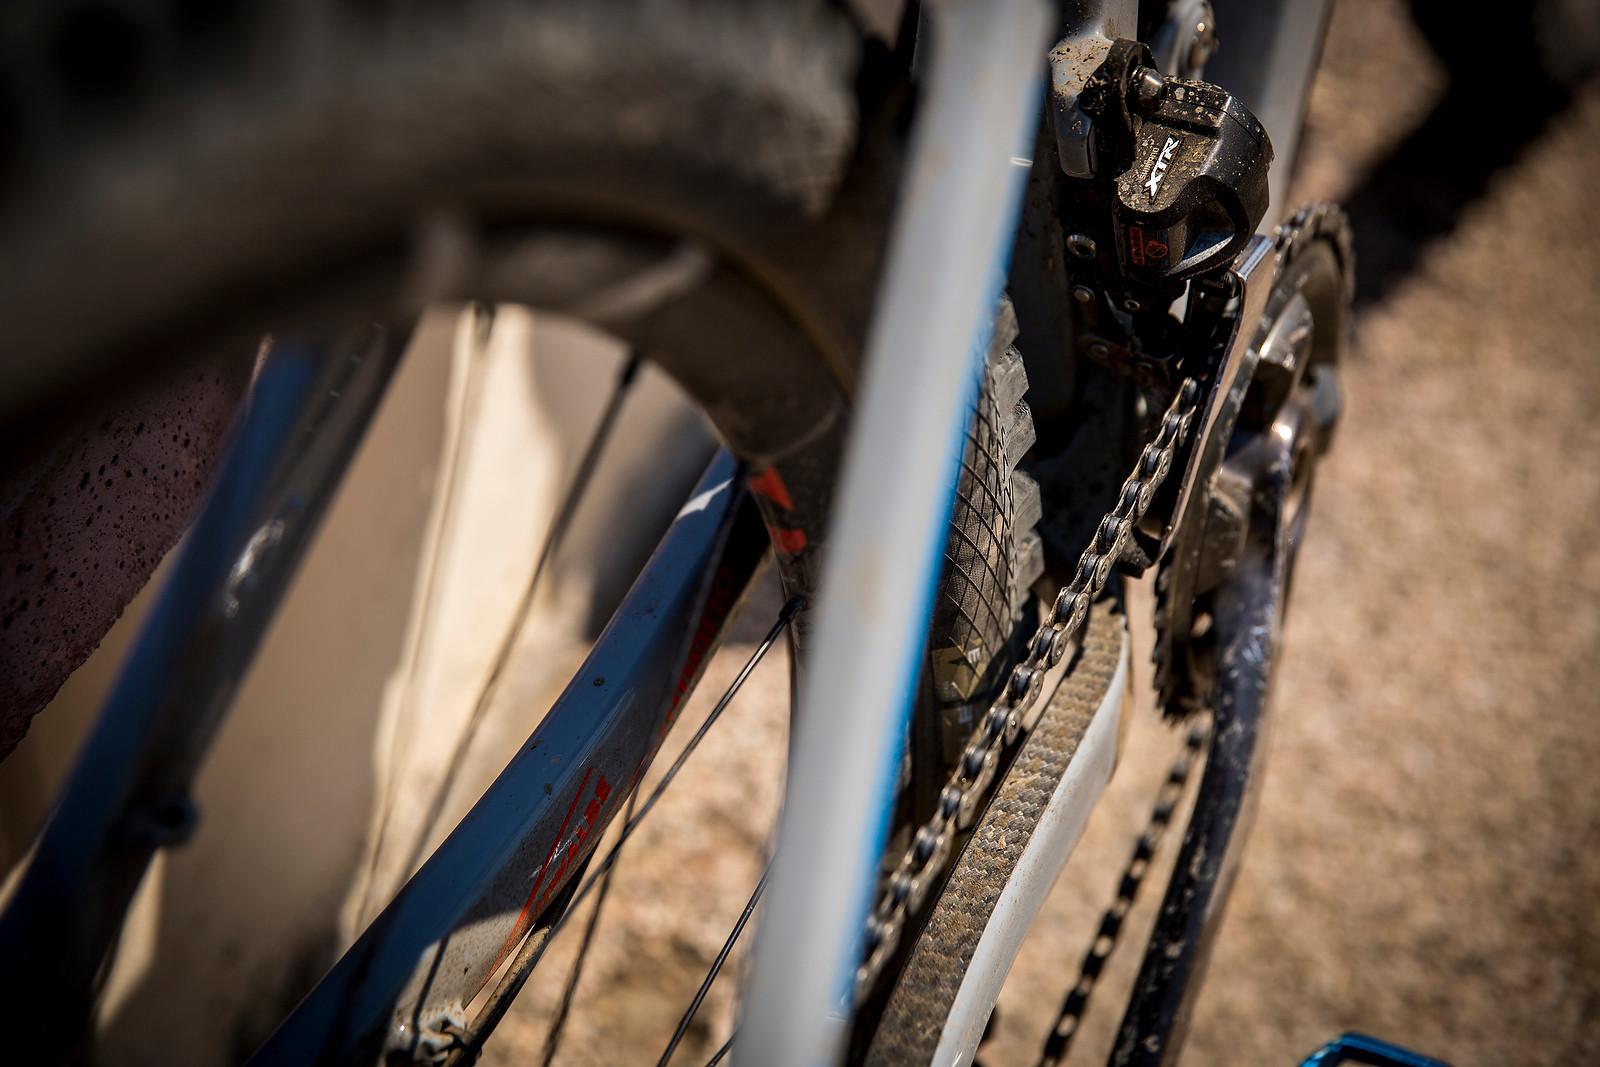 Shimano XTR Di2 2x Setup on Nico Lau's Cube - WINNING BIKE: Nico Lau's Cube Stereo 140 29 - Mountain Biking Pictures - Vital MTB